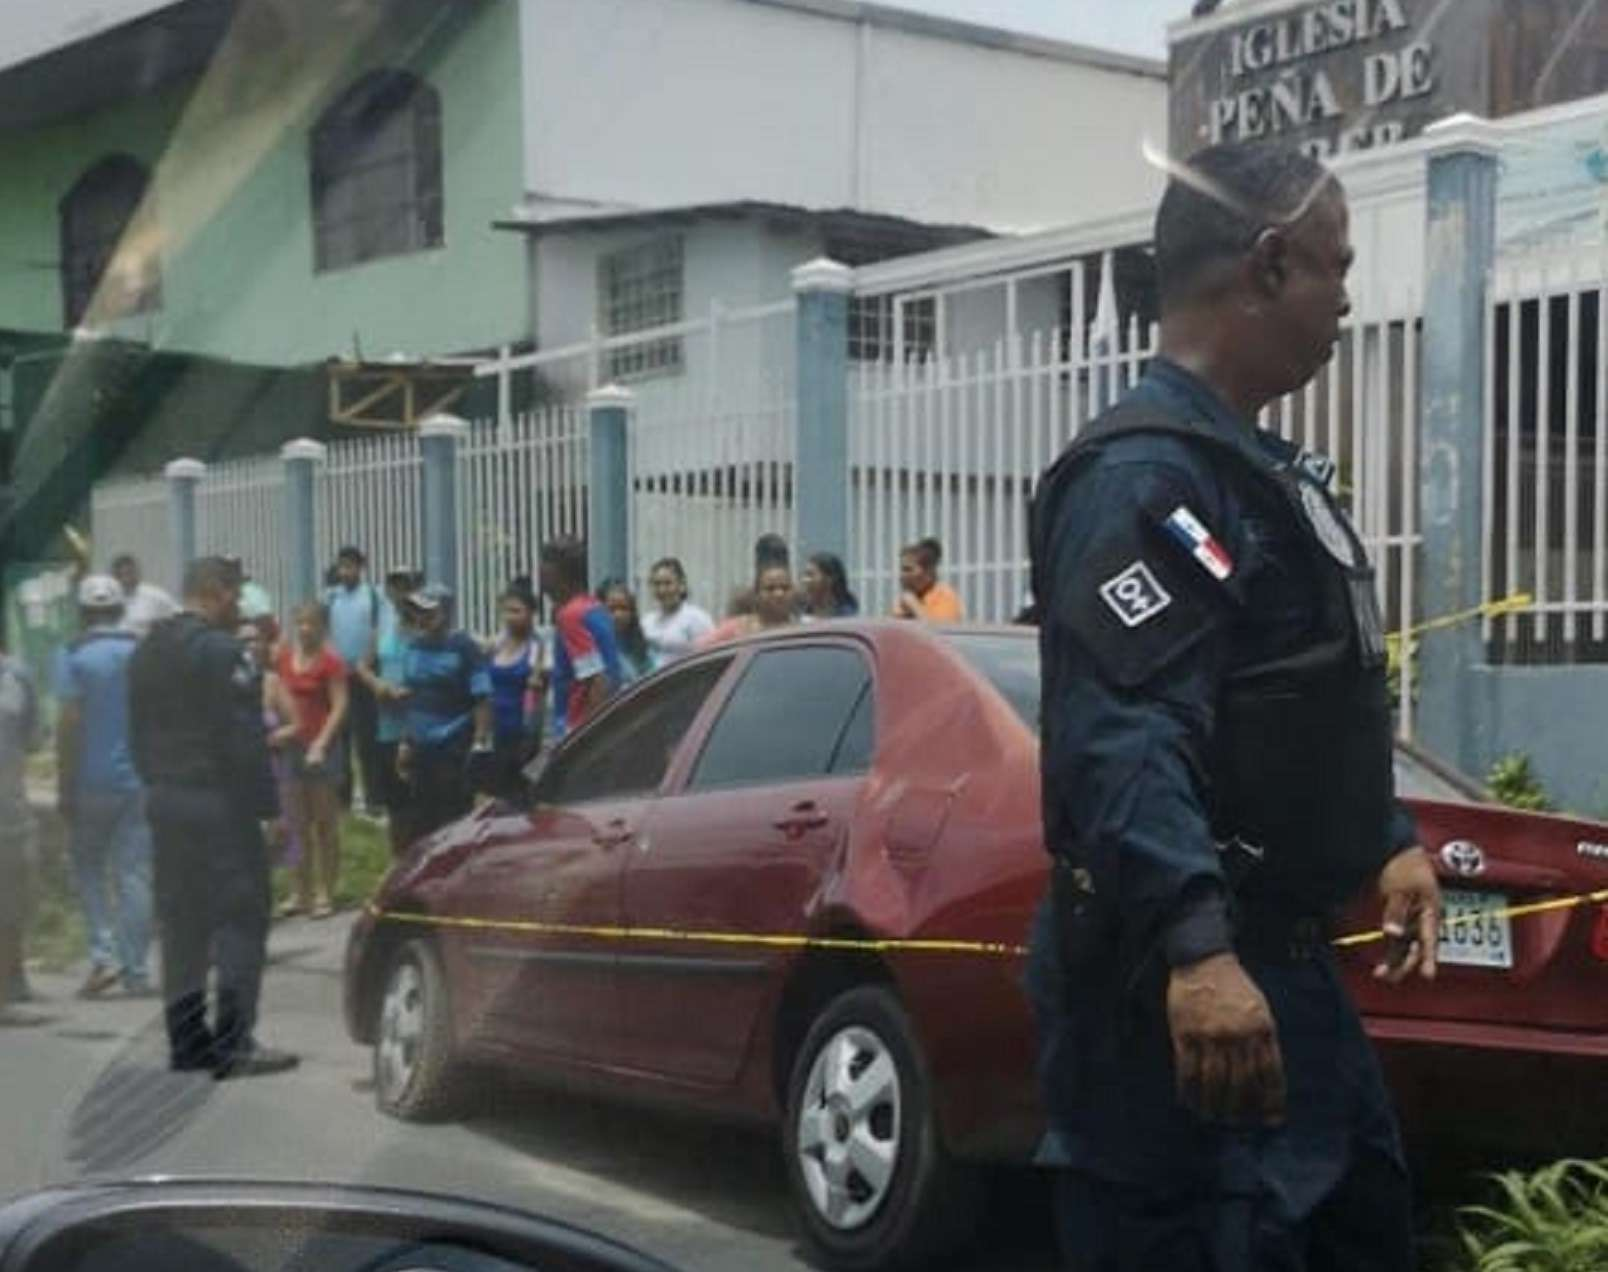 Escena del crimen en La Pavita.  Foto: @TraficoCPanama